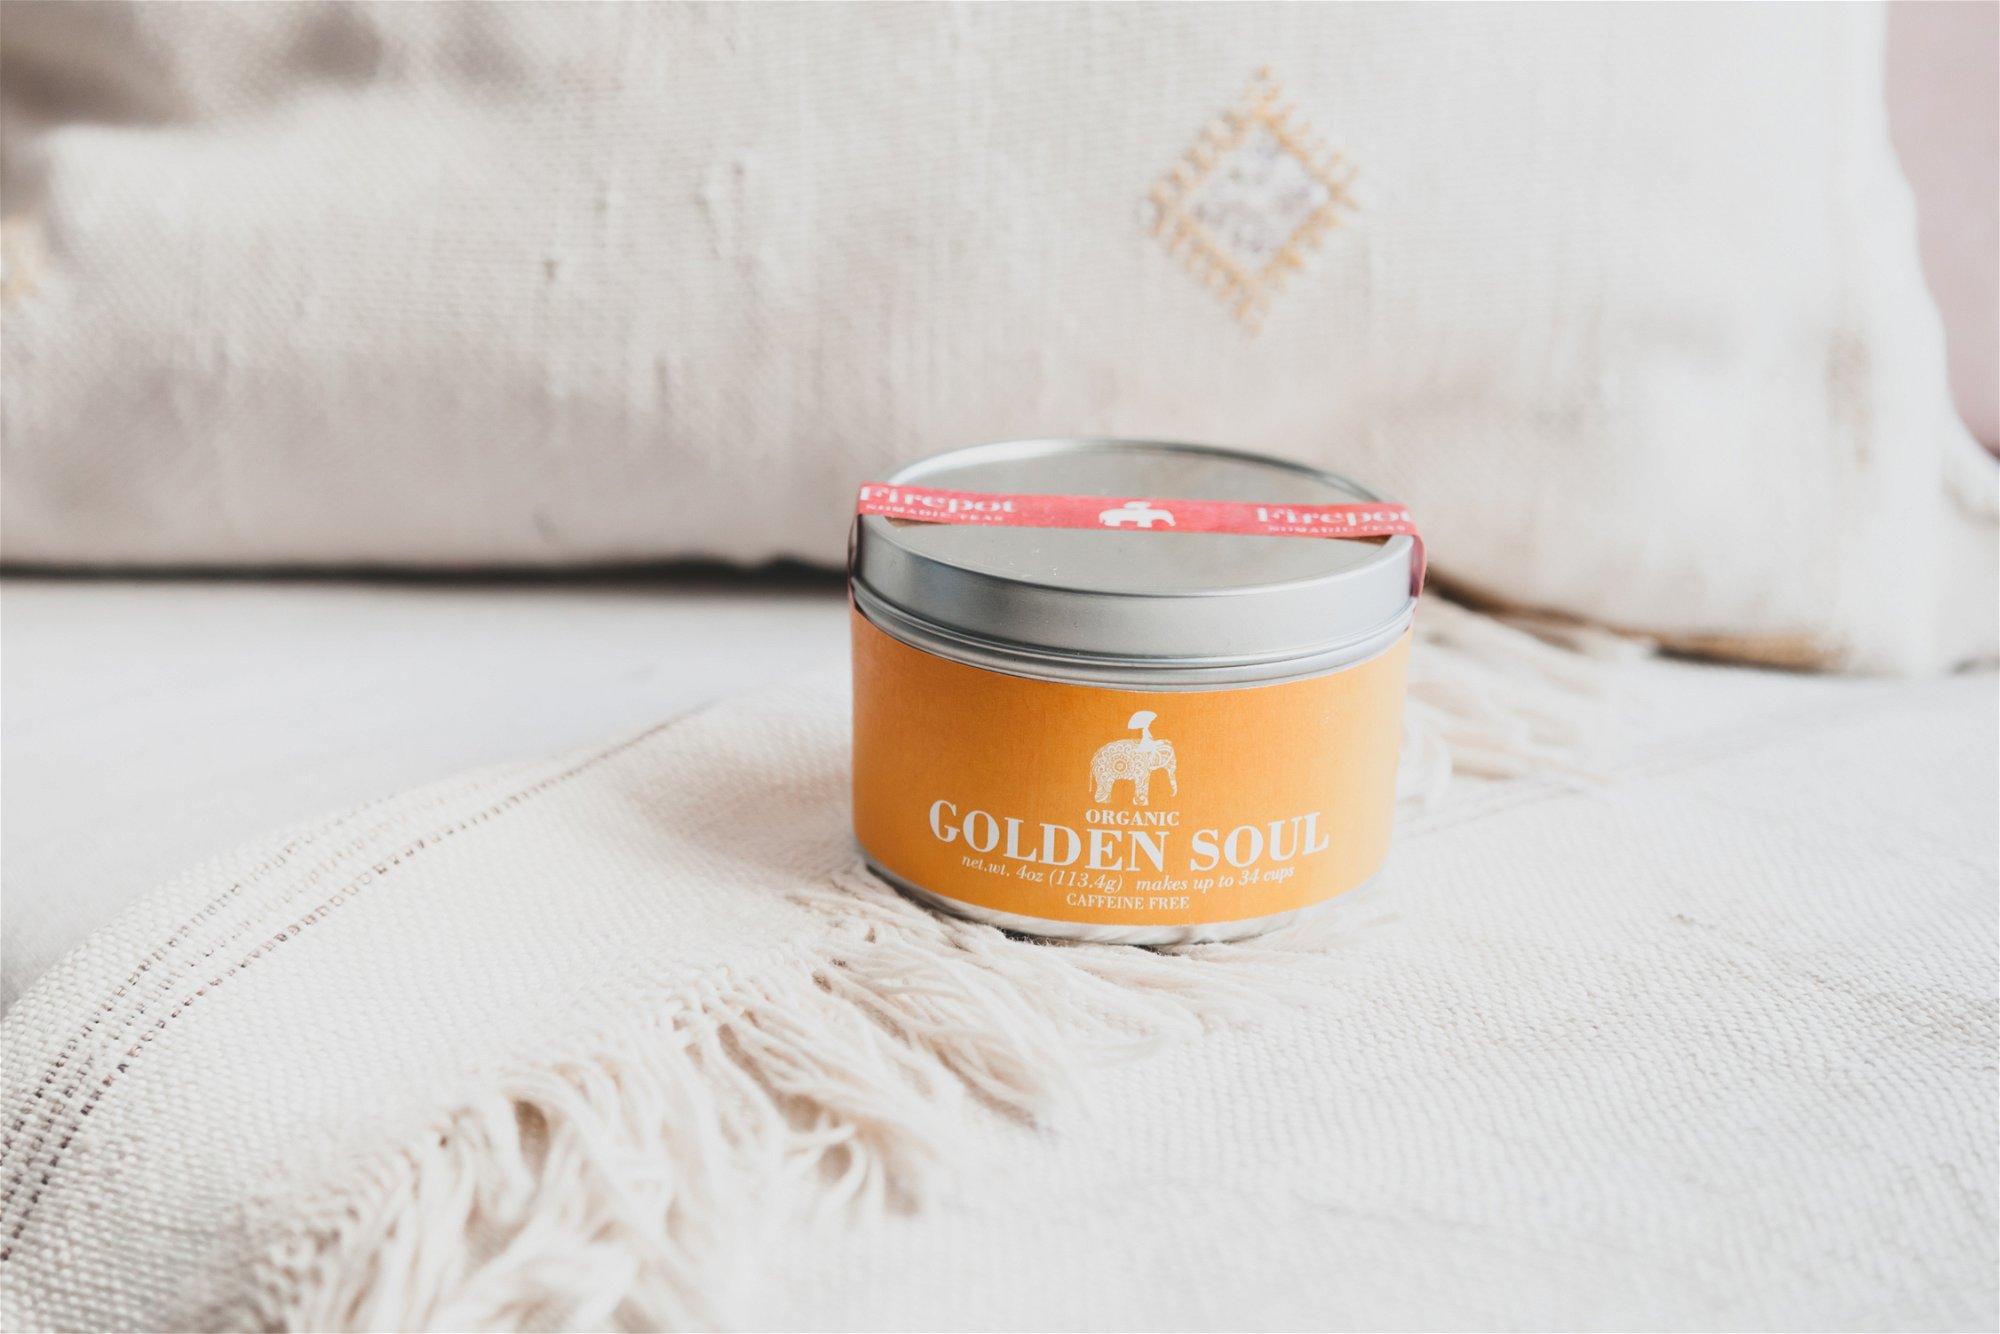 Golden Soul Turmeric Powder Tin